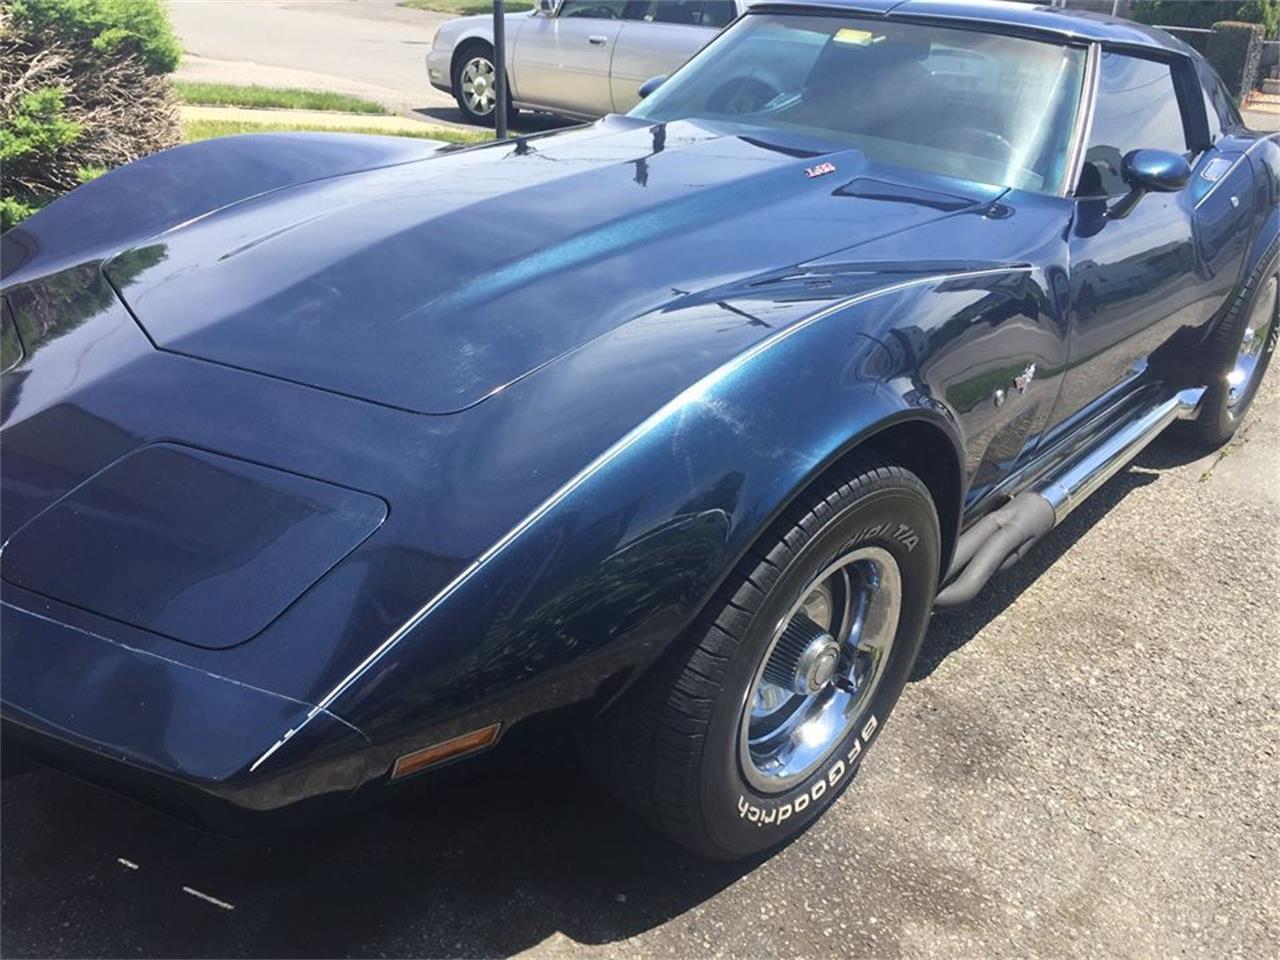 1977 Chevrolet Corvette (CC-1142996) for sale in West Pittston, Pennsylvania